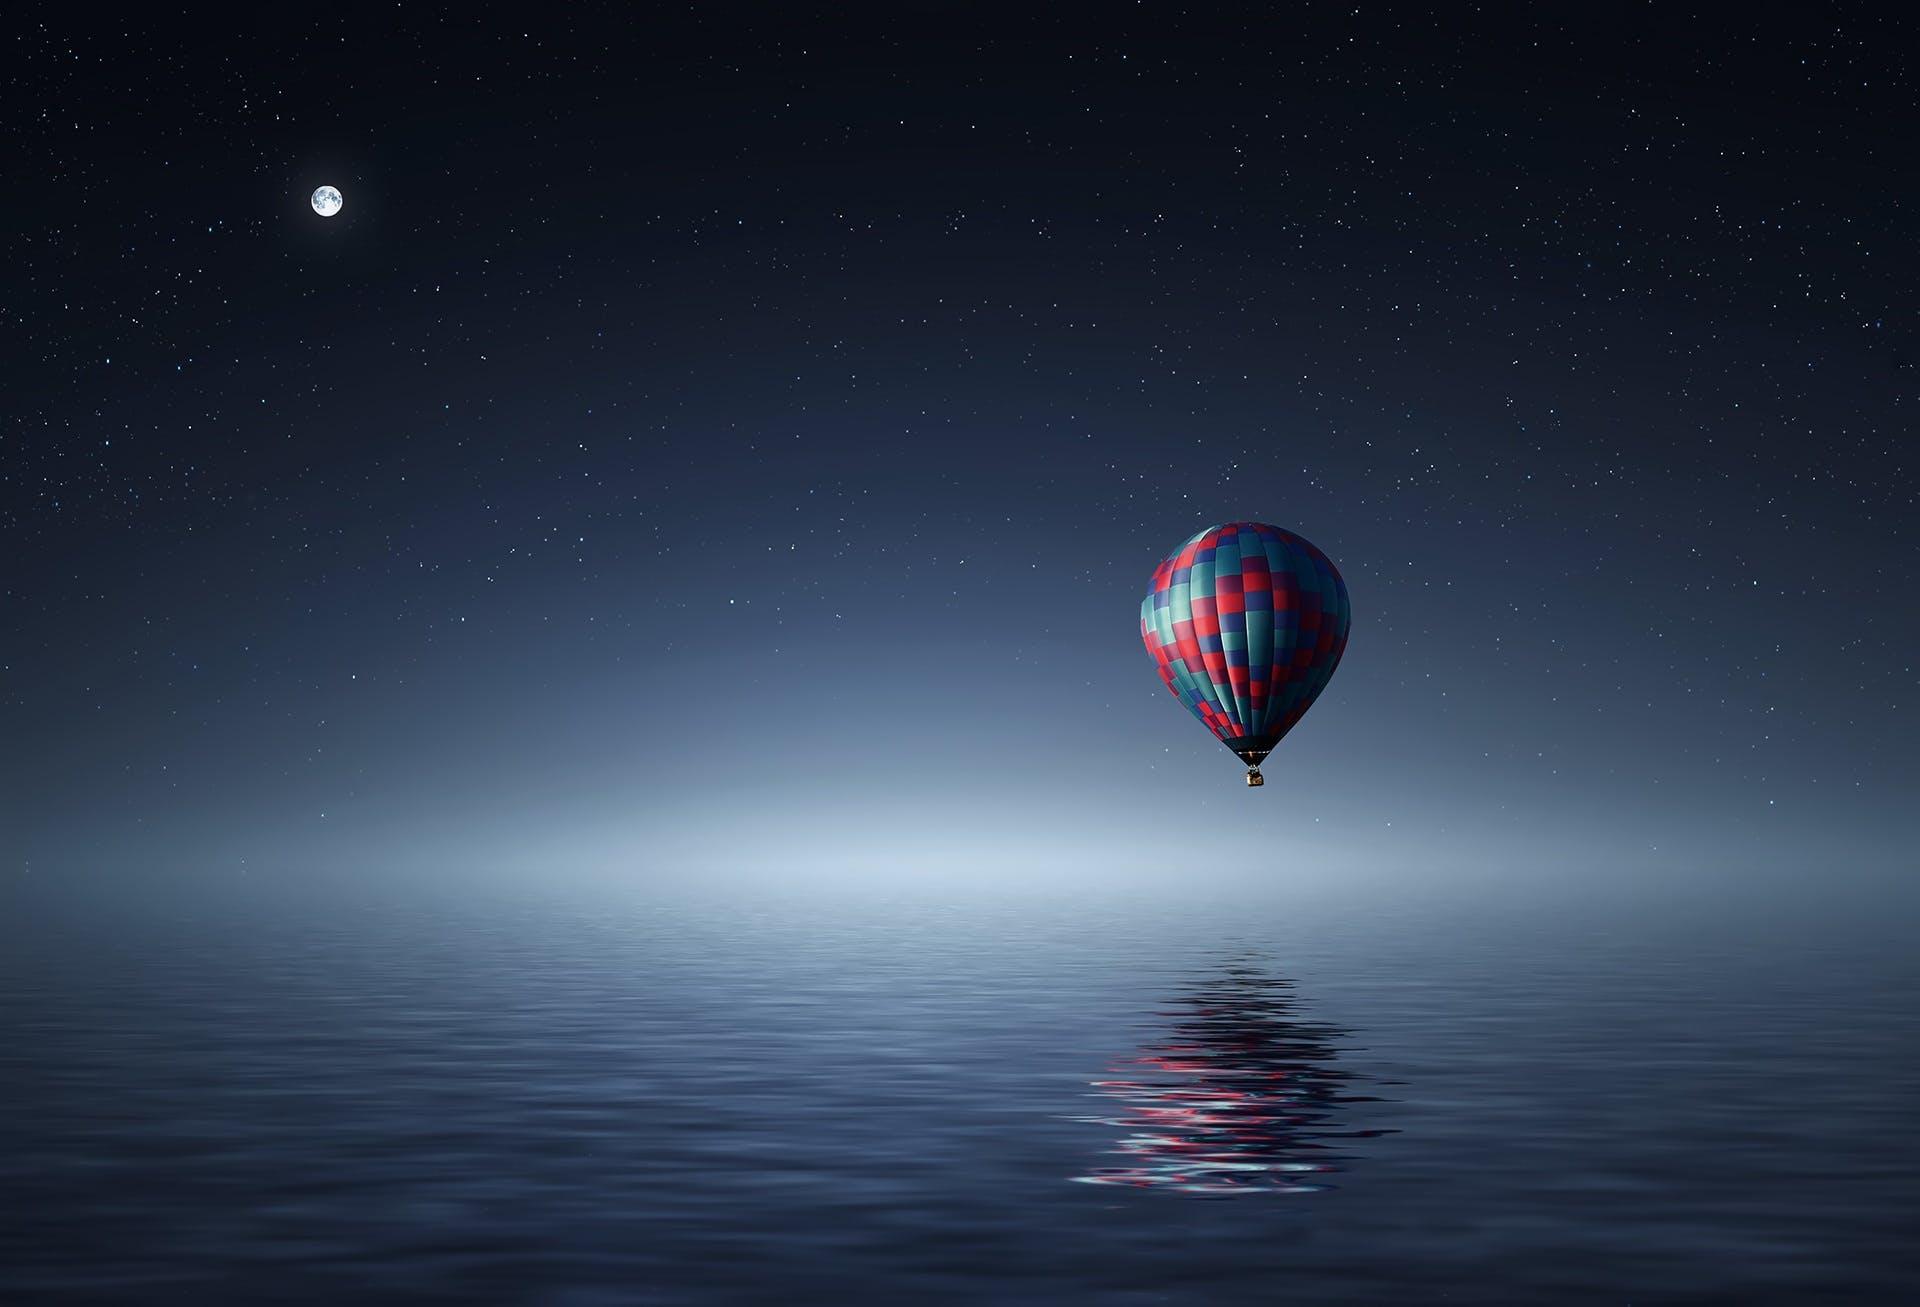 açık, armoni, ay, Ay ışığı içeren Ücretsiz stok fotoğraf